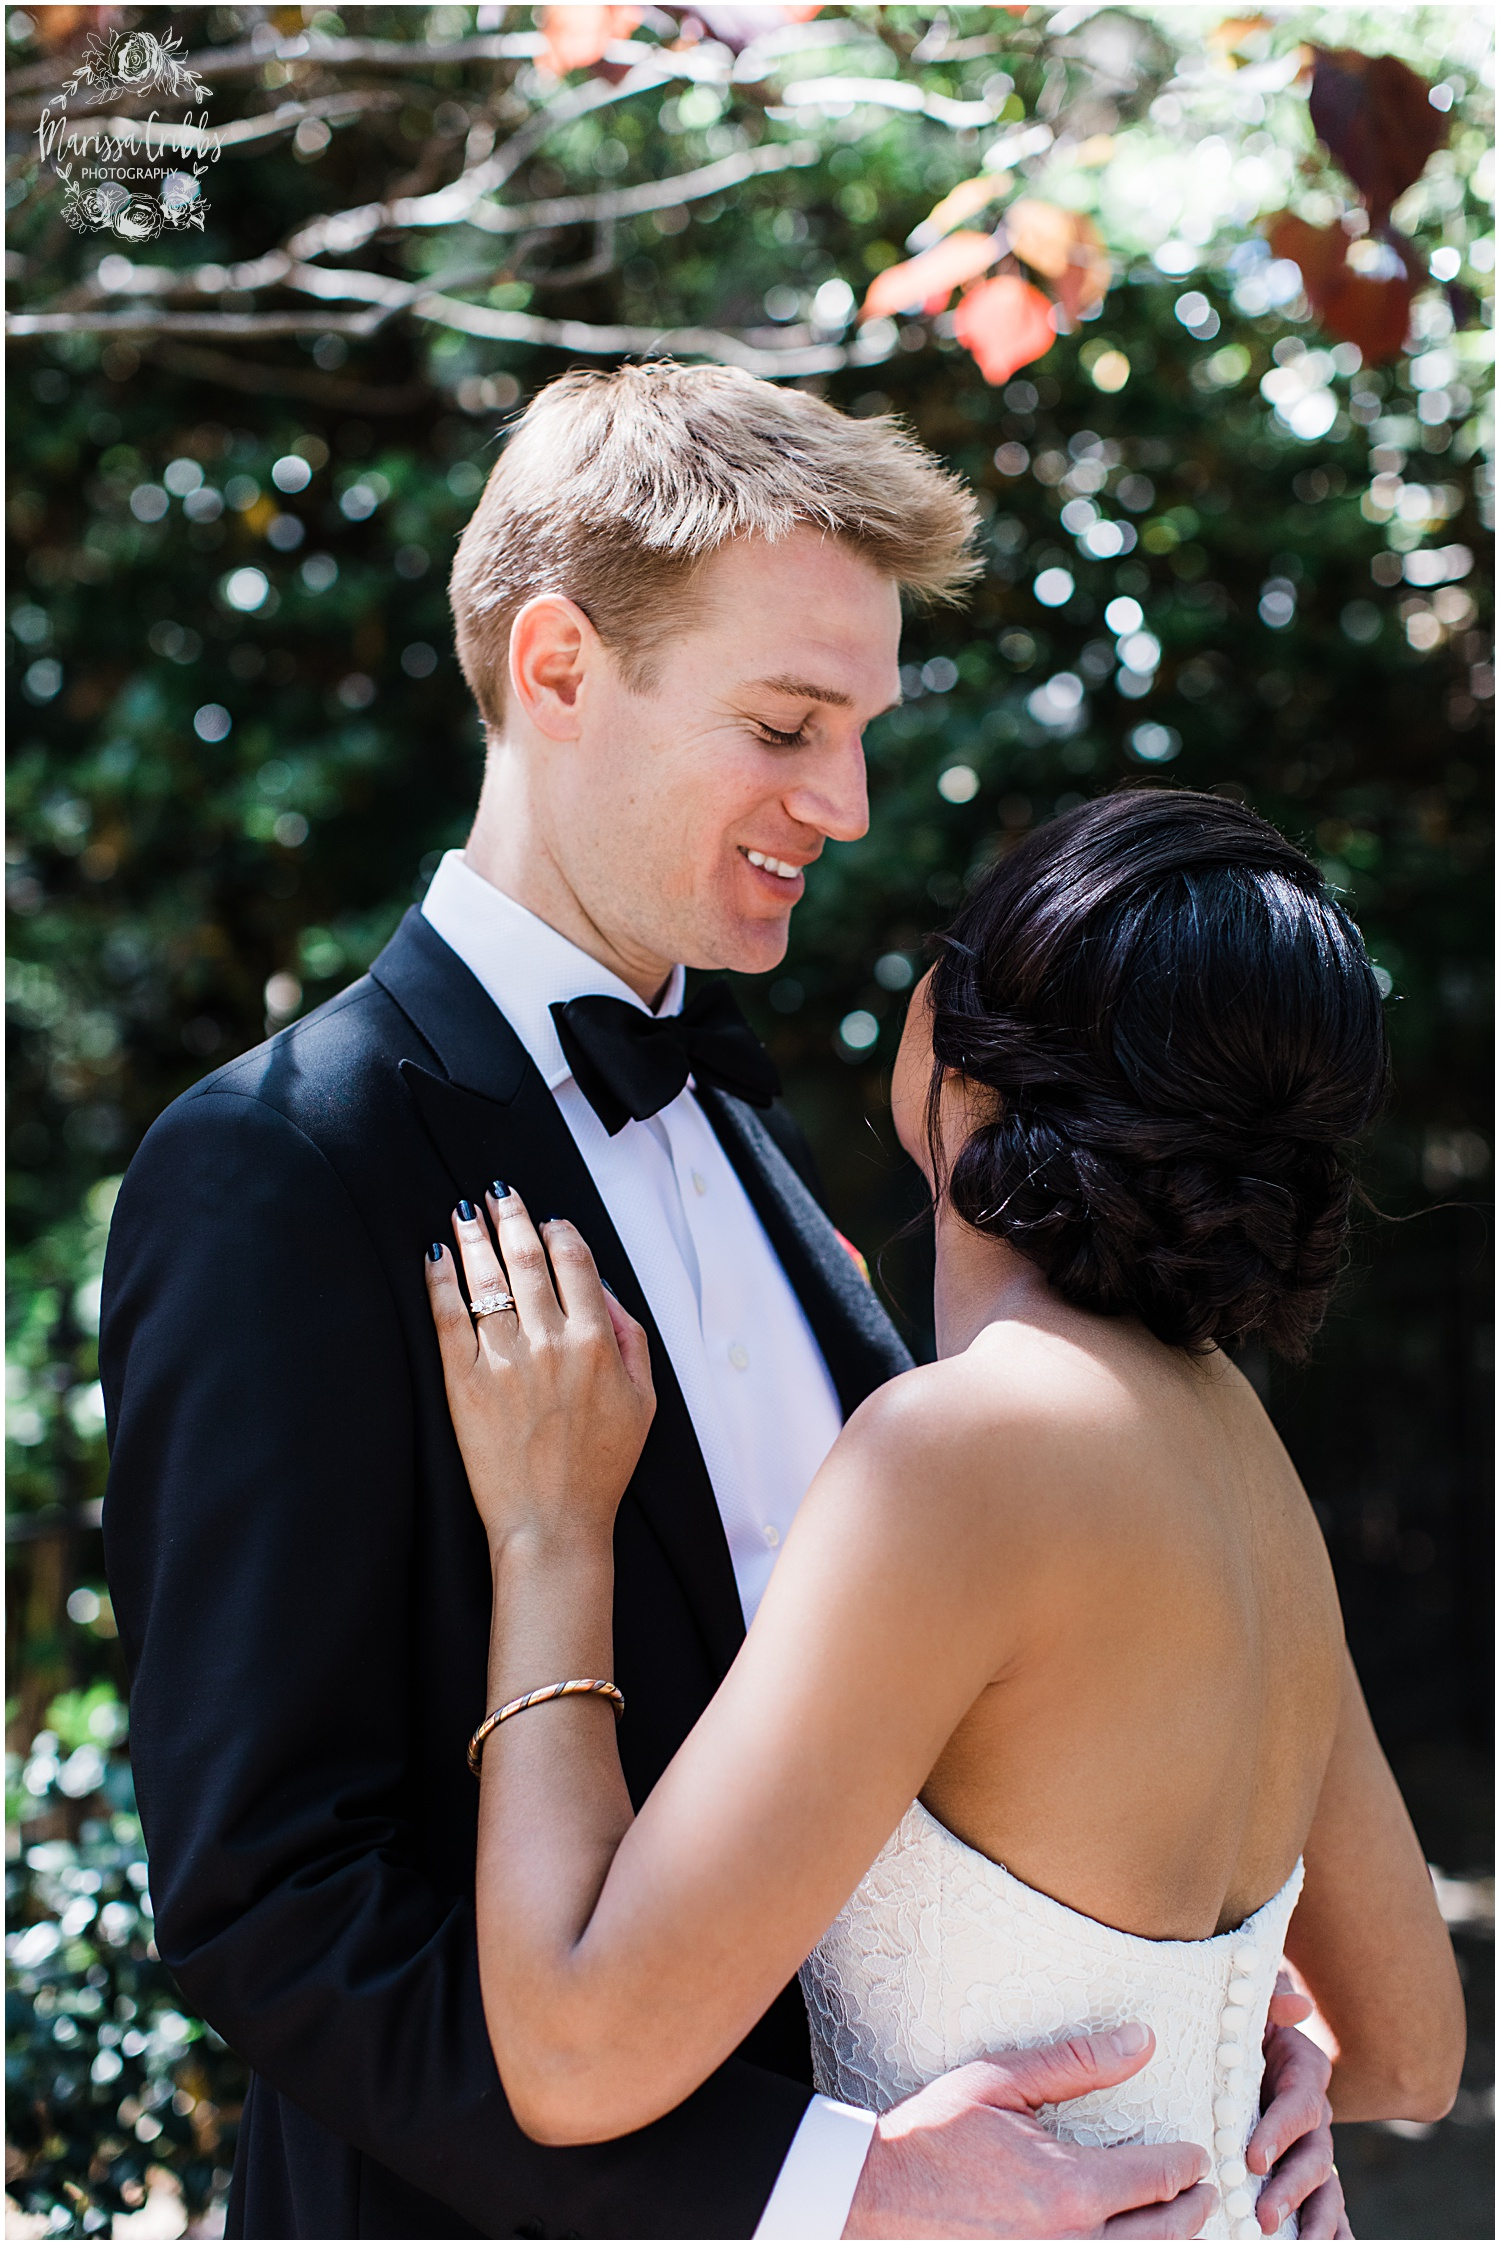 NEW ORLEANS WEDDING   BENACHI HOUSE   SARAH & MICHAEL   MARISSA CRIBBS PHOTOGRAPHY_4419.jpg